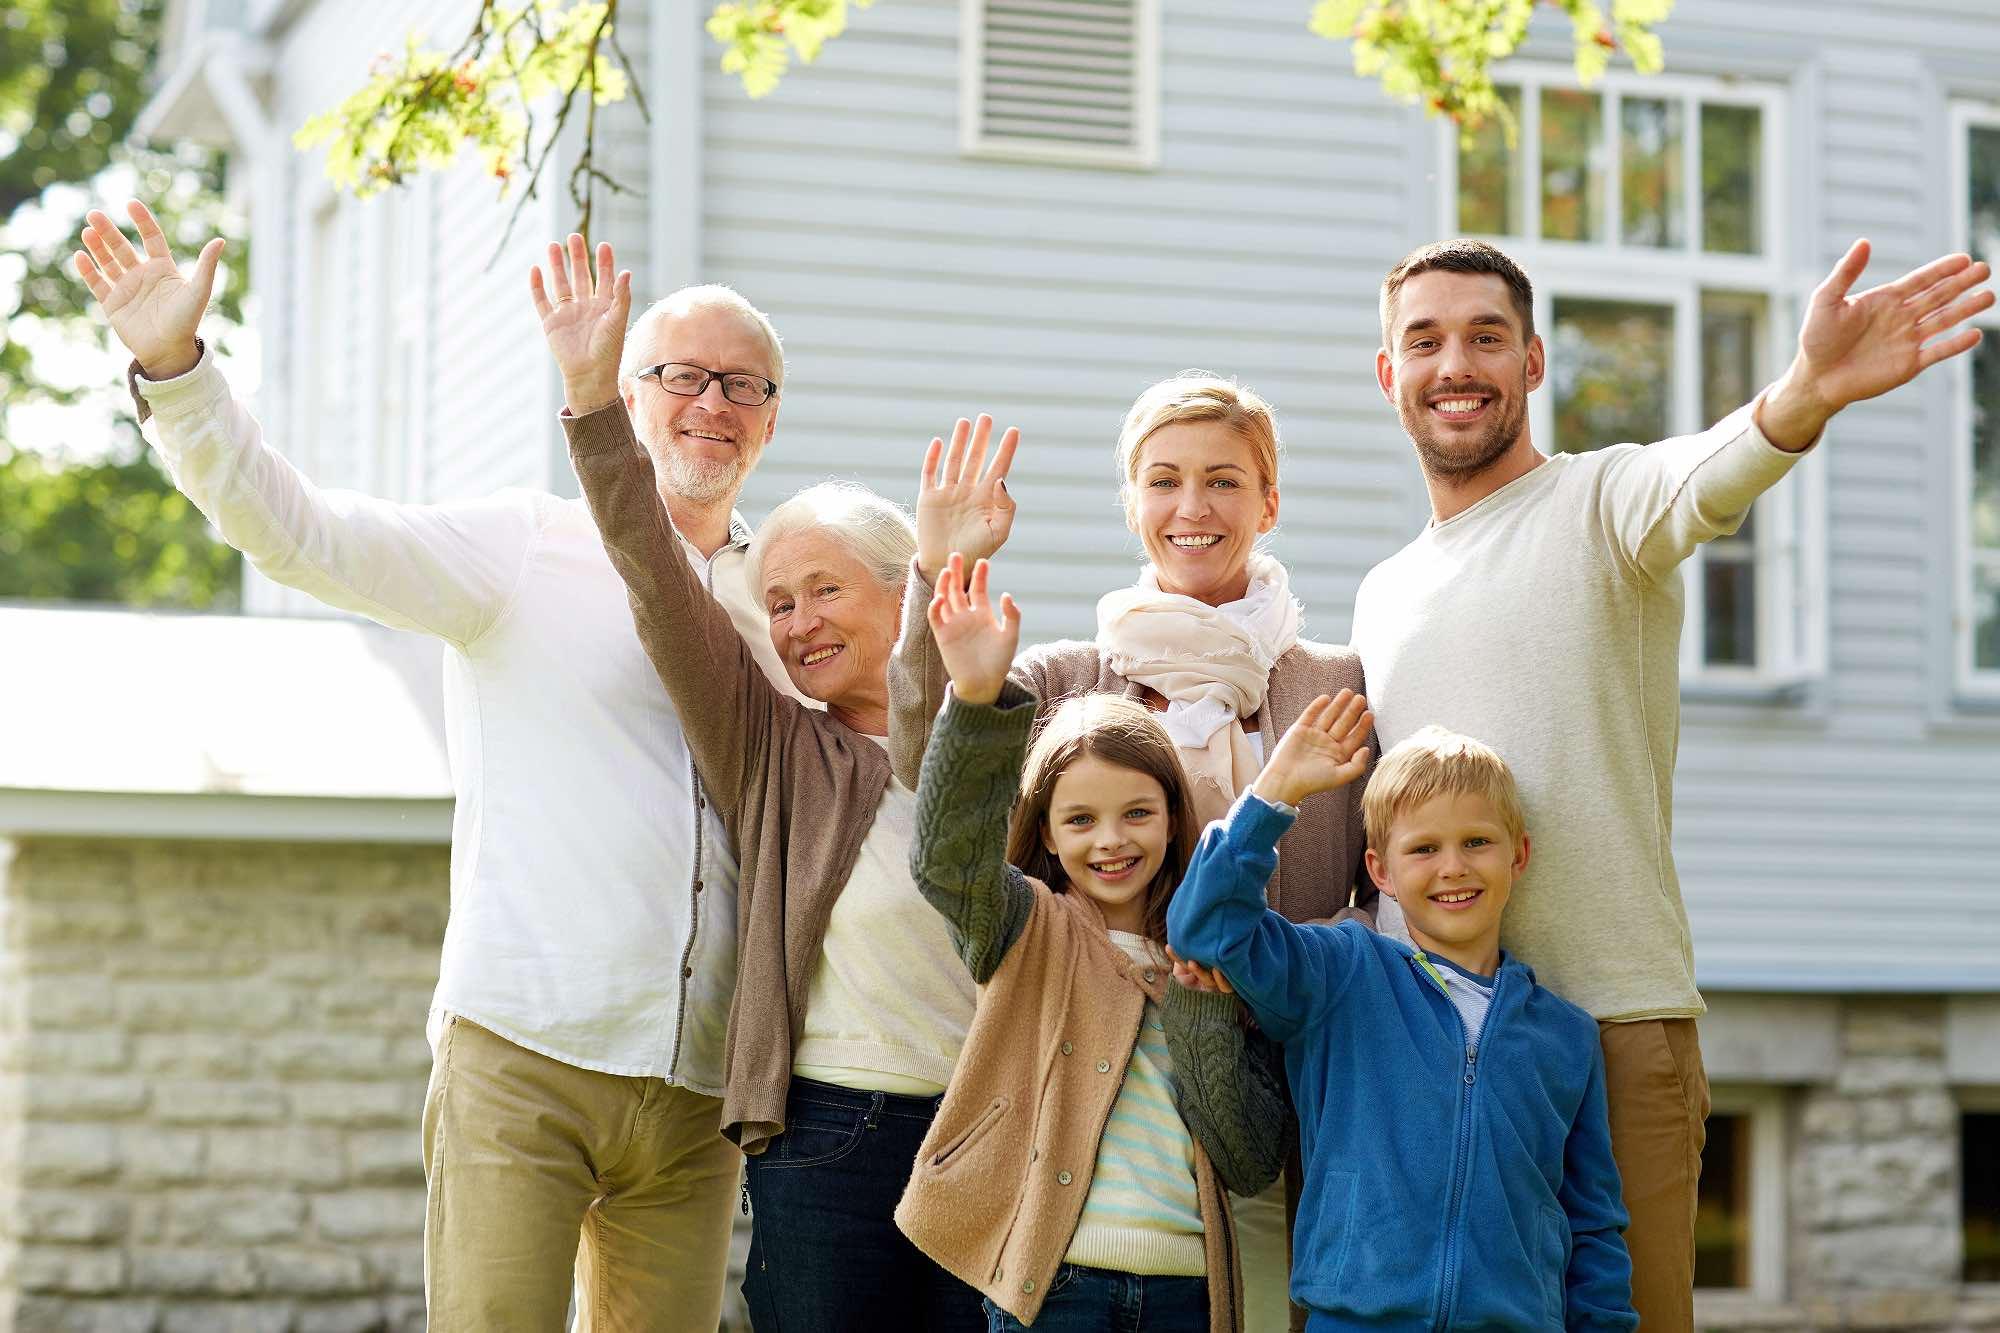 Buy your next home with Pemberton Holmes in Westshore (Victoria), B.C.